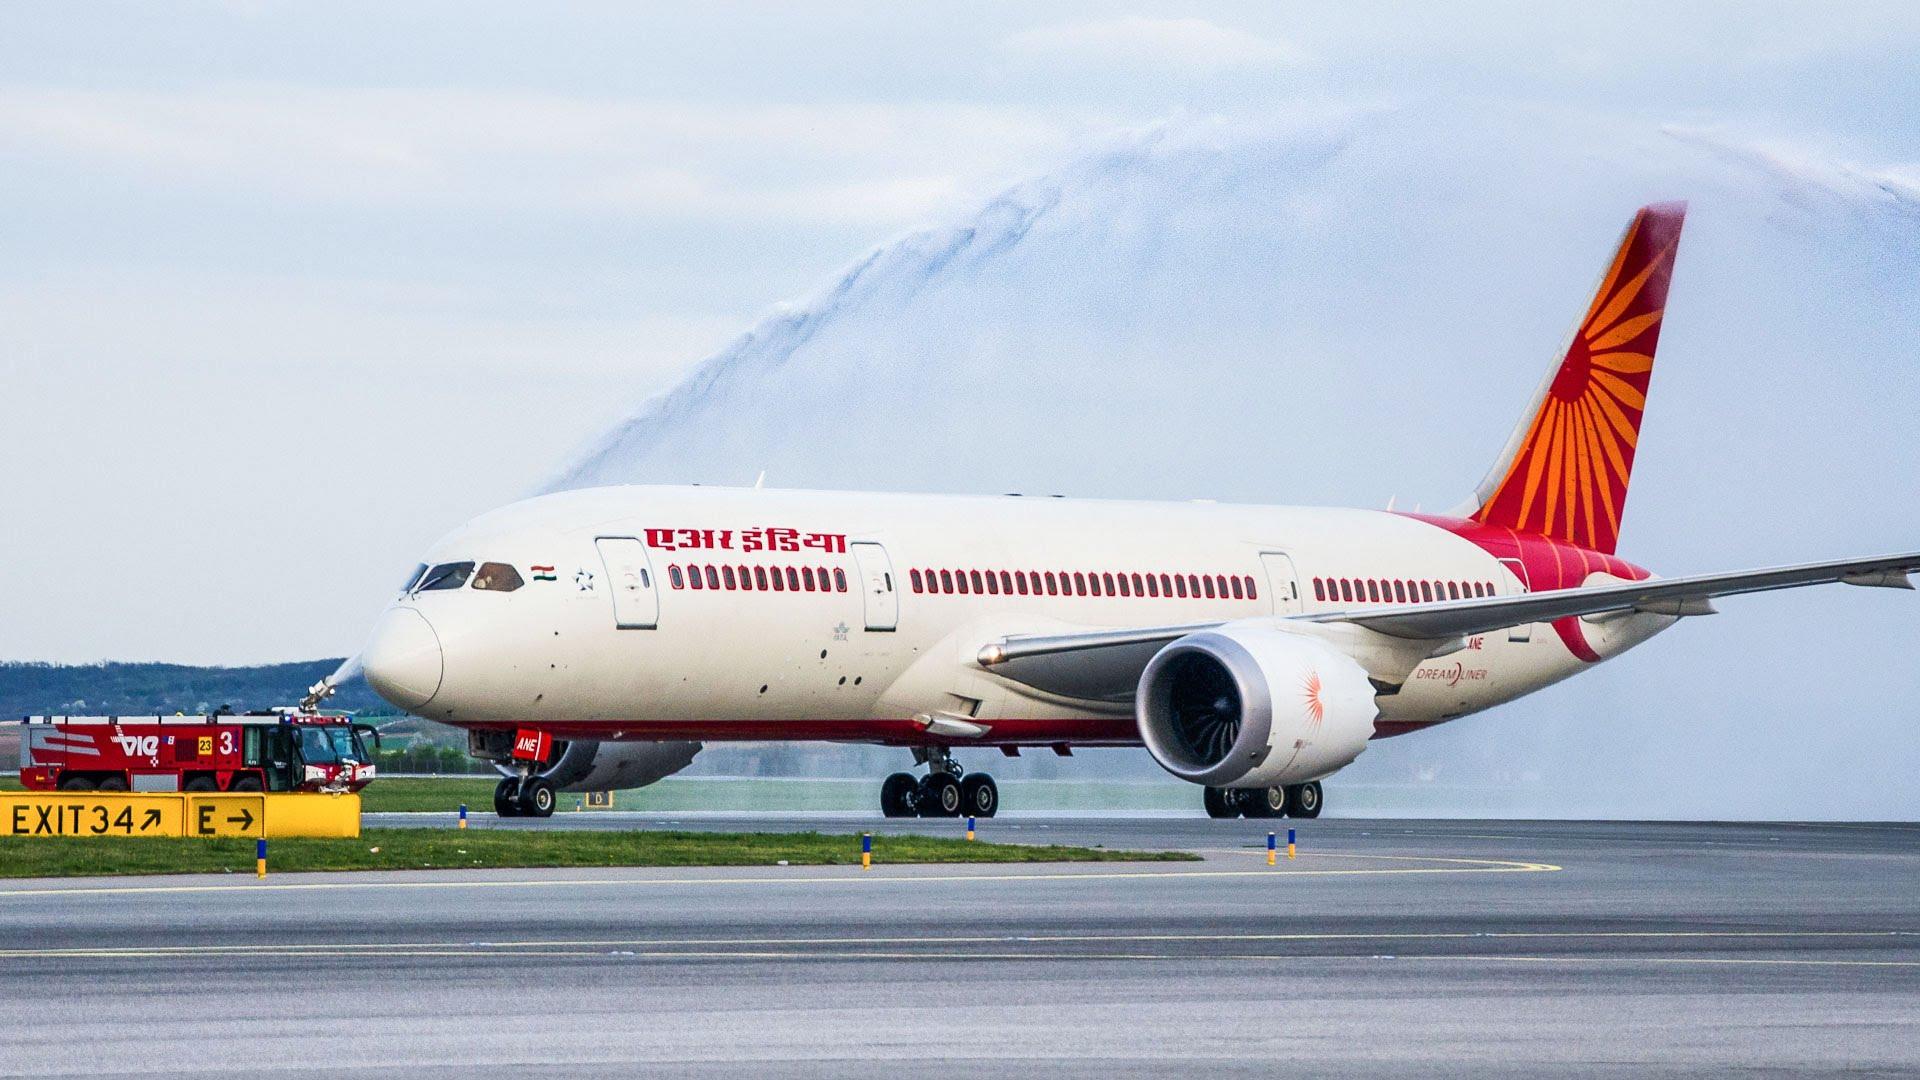 Air India, Jet Airways, Summer Holidays, Delhi-Dubai, Mumbai-Dubai, Delhi-Mumbai, India Dubai, Domestic flights, International flights, India cities, Business news